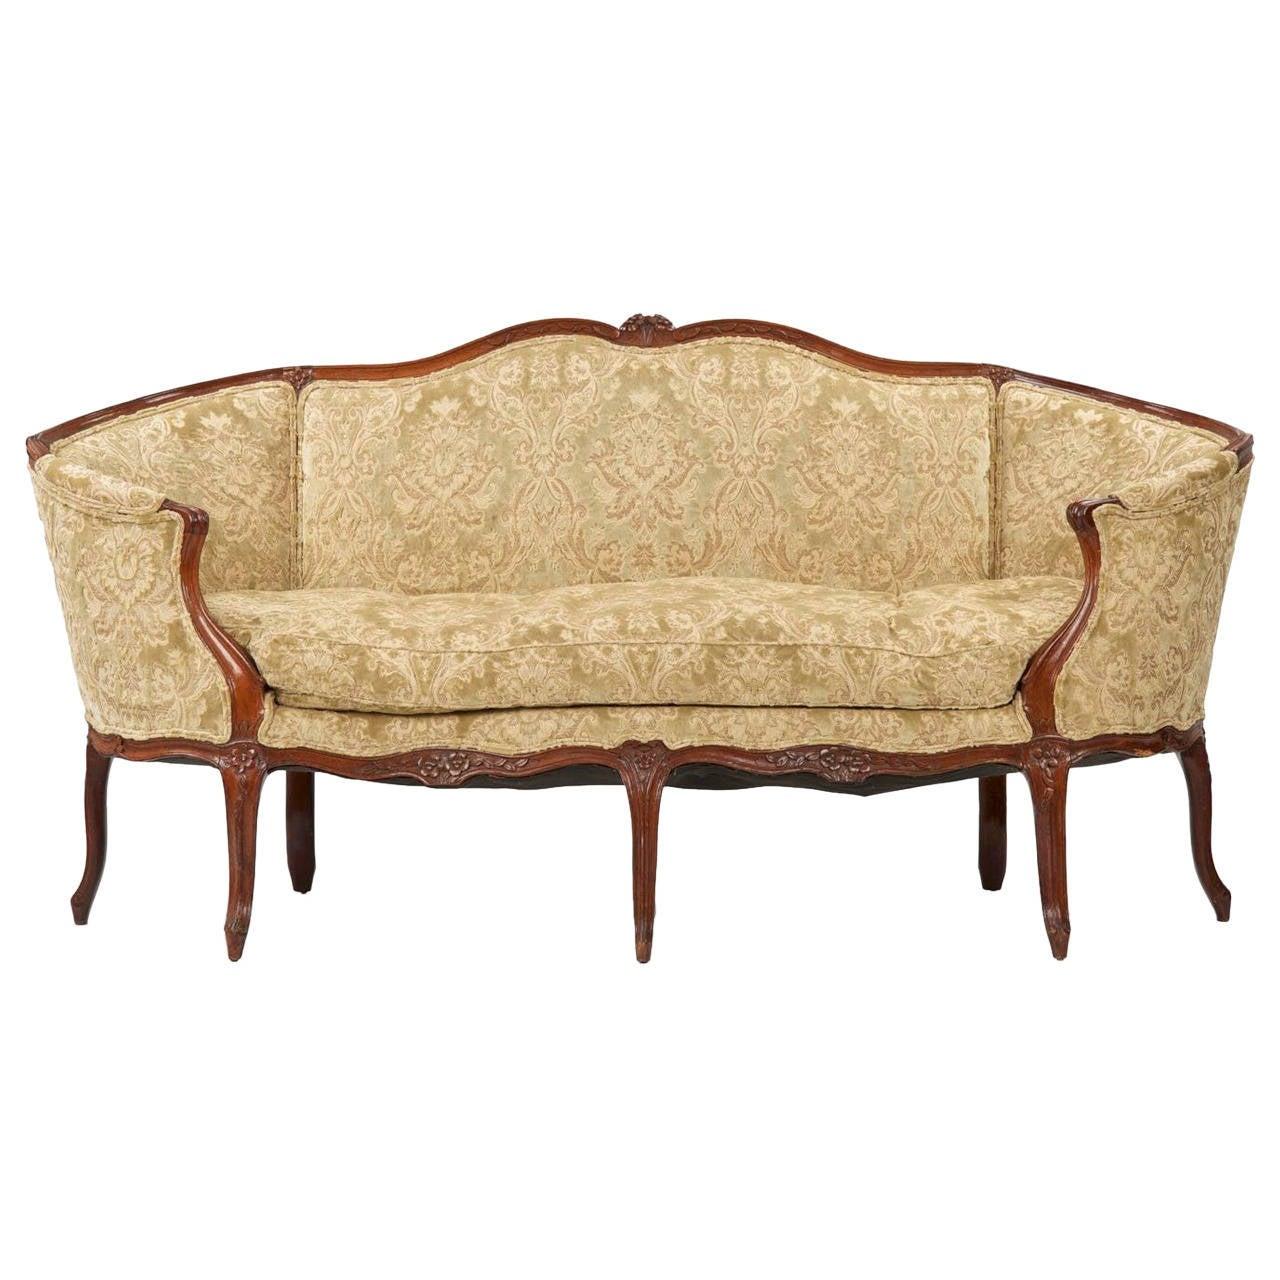 French furniture sofa - Fine French Louis Xv Period Walnut Antique Canap Settee Sofa Circa 1750 1